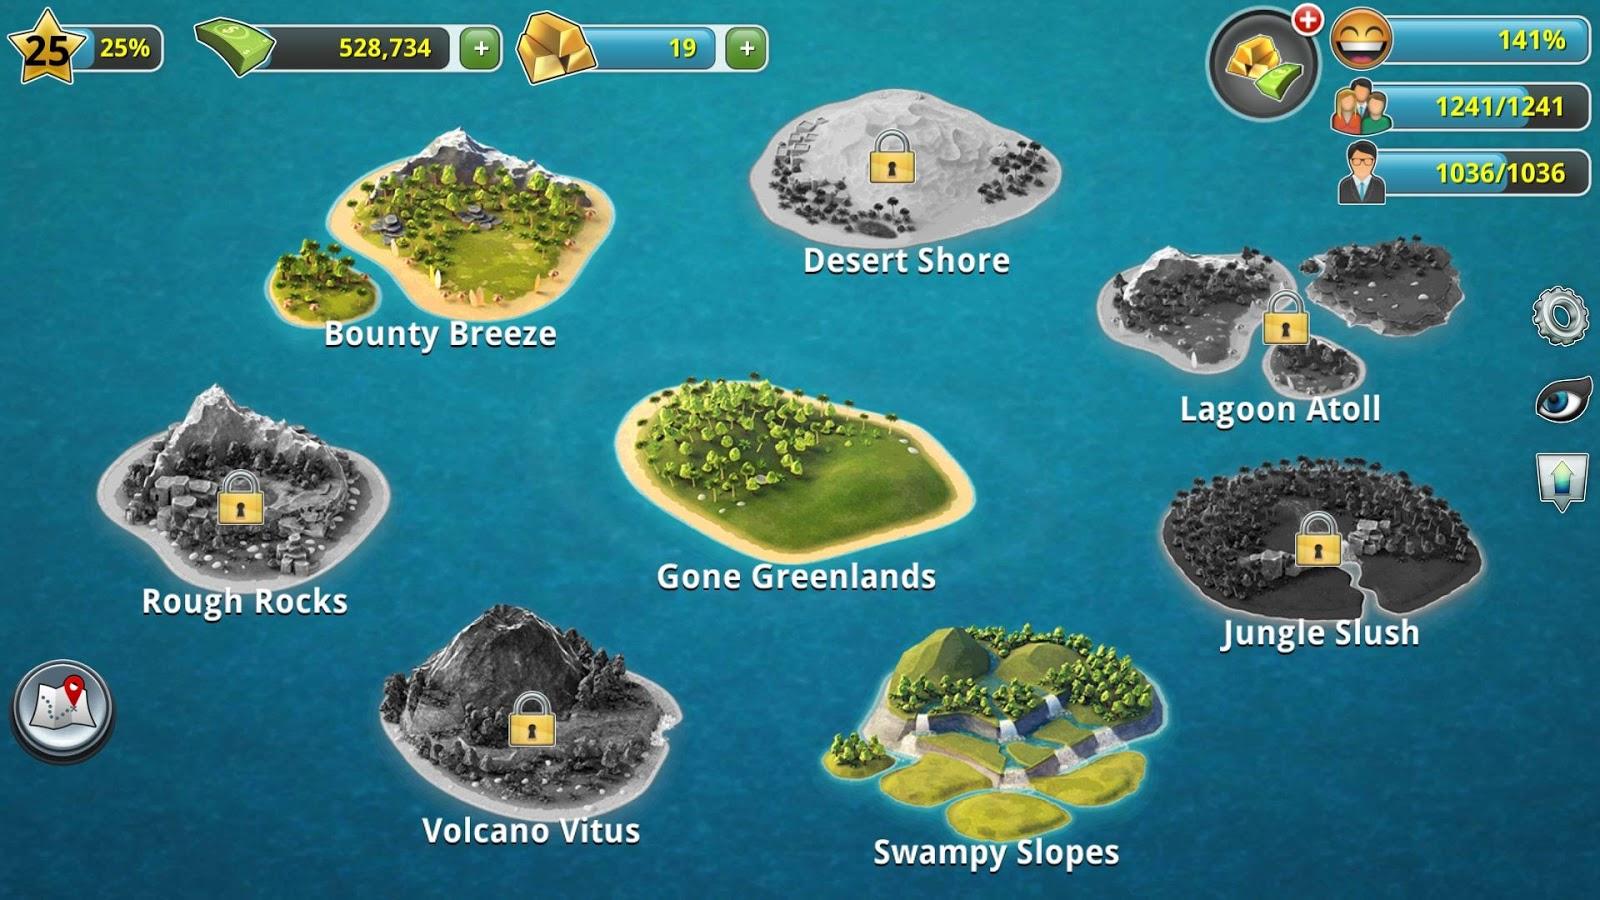 ... Building Sim 1.3.1 Mod Apk (Unlimited Money) | Apk Mod Ygrec